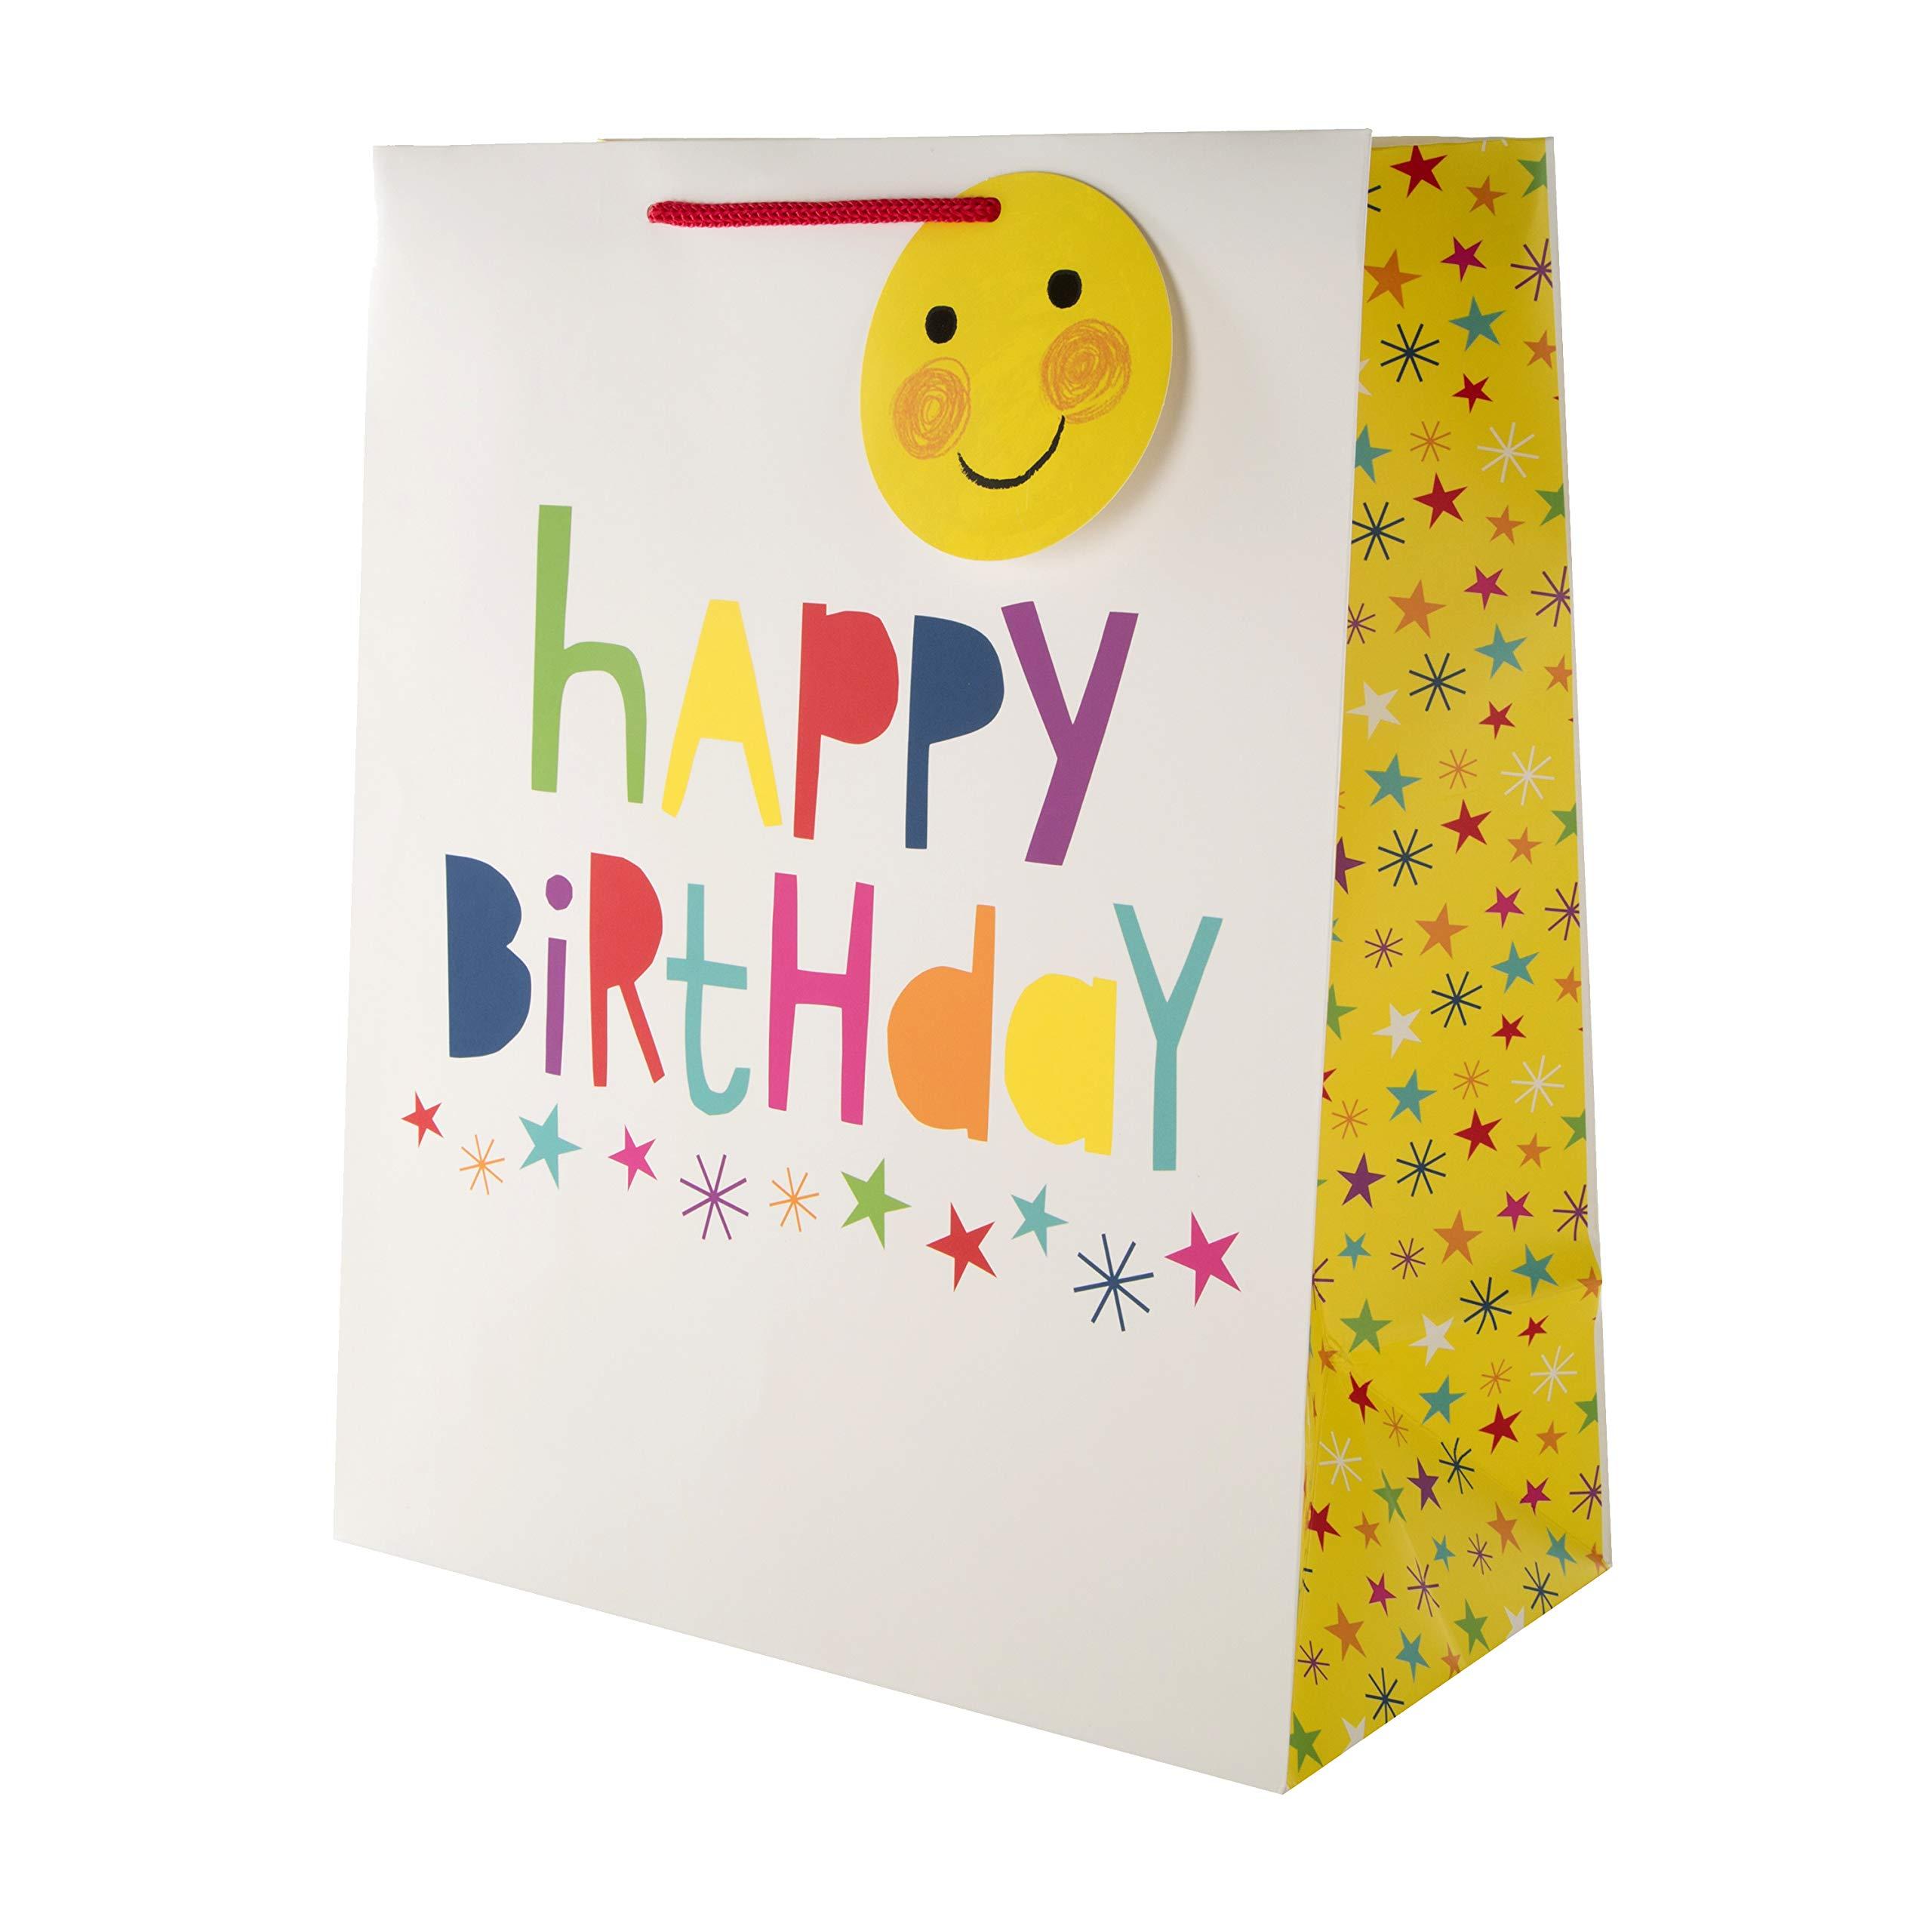 Large Gift Bag from Hallmark - Happy Birthday Design